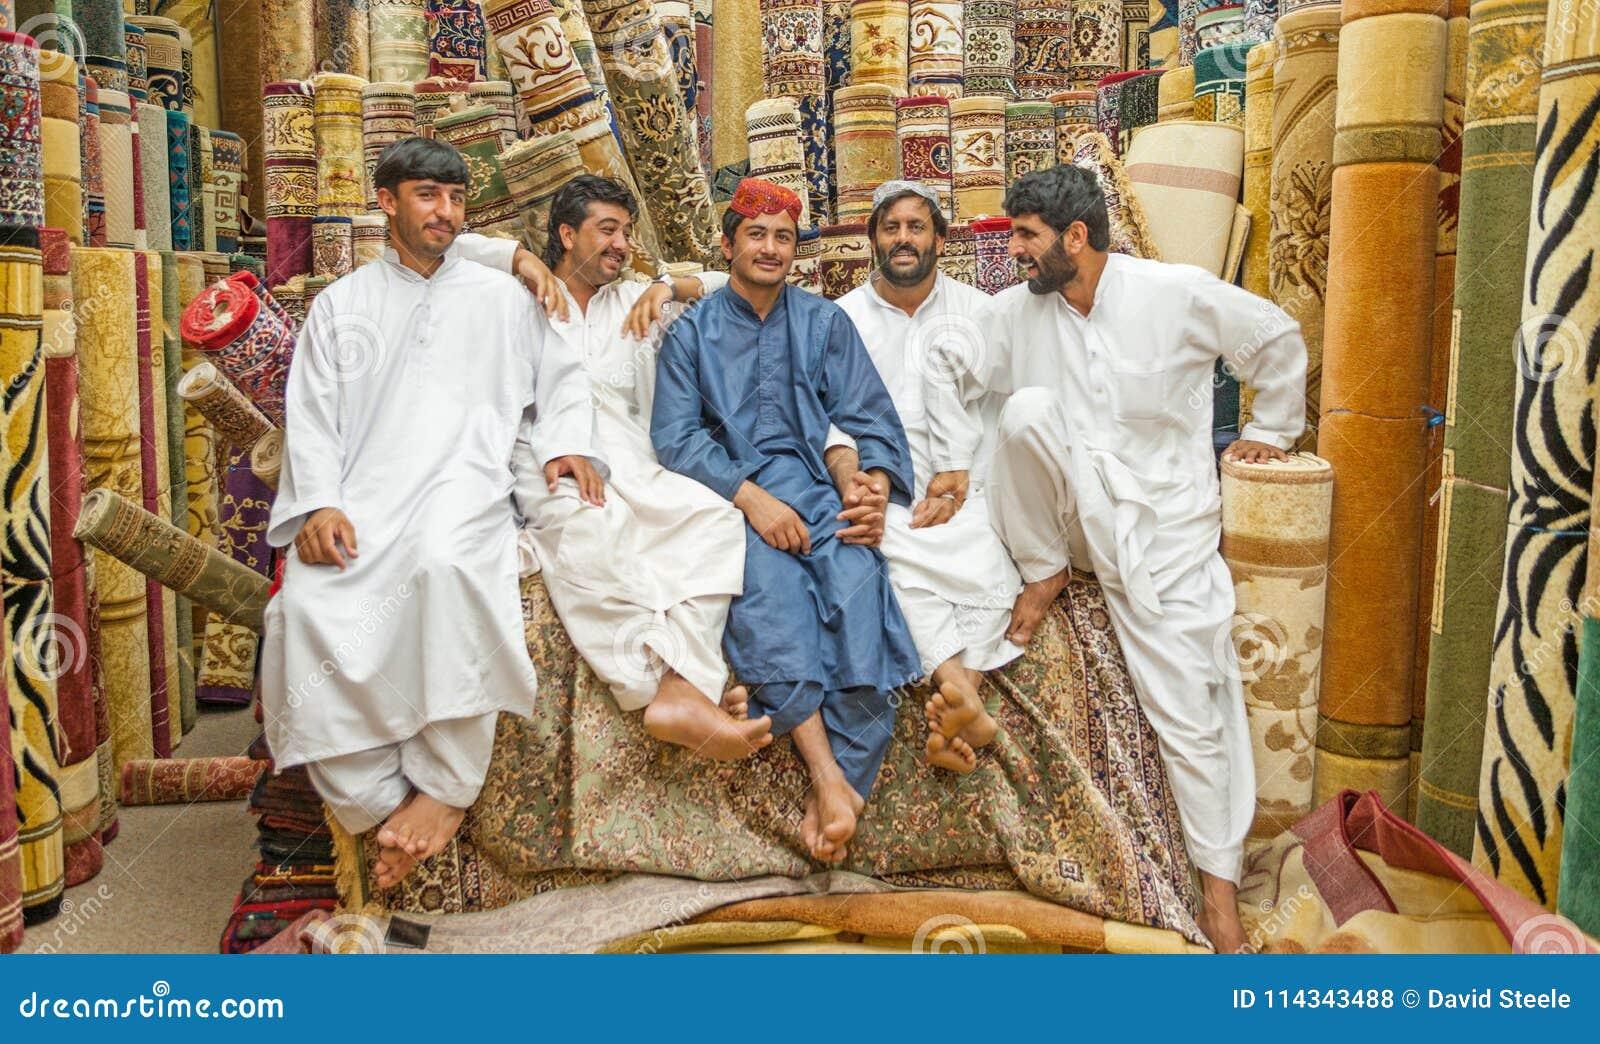 Men At The Carpet Souk In Abu Dhabi Editorial Stock Photo - Image of